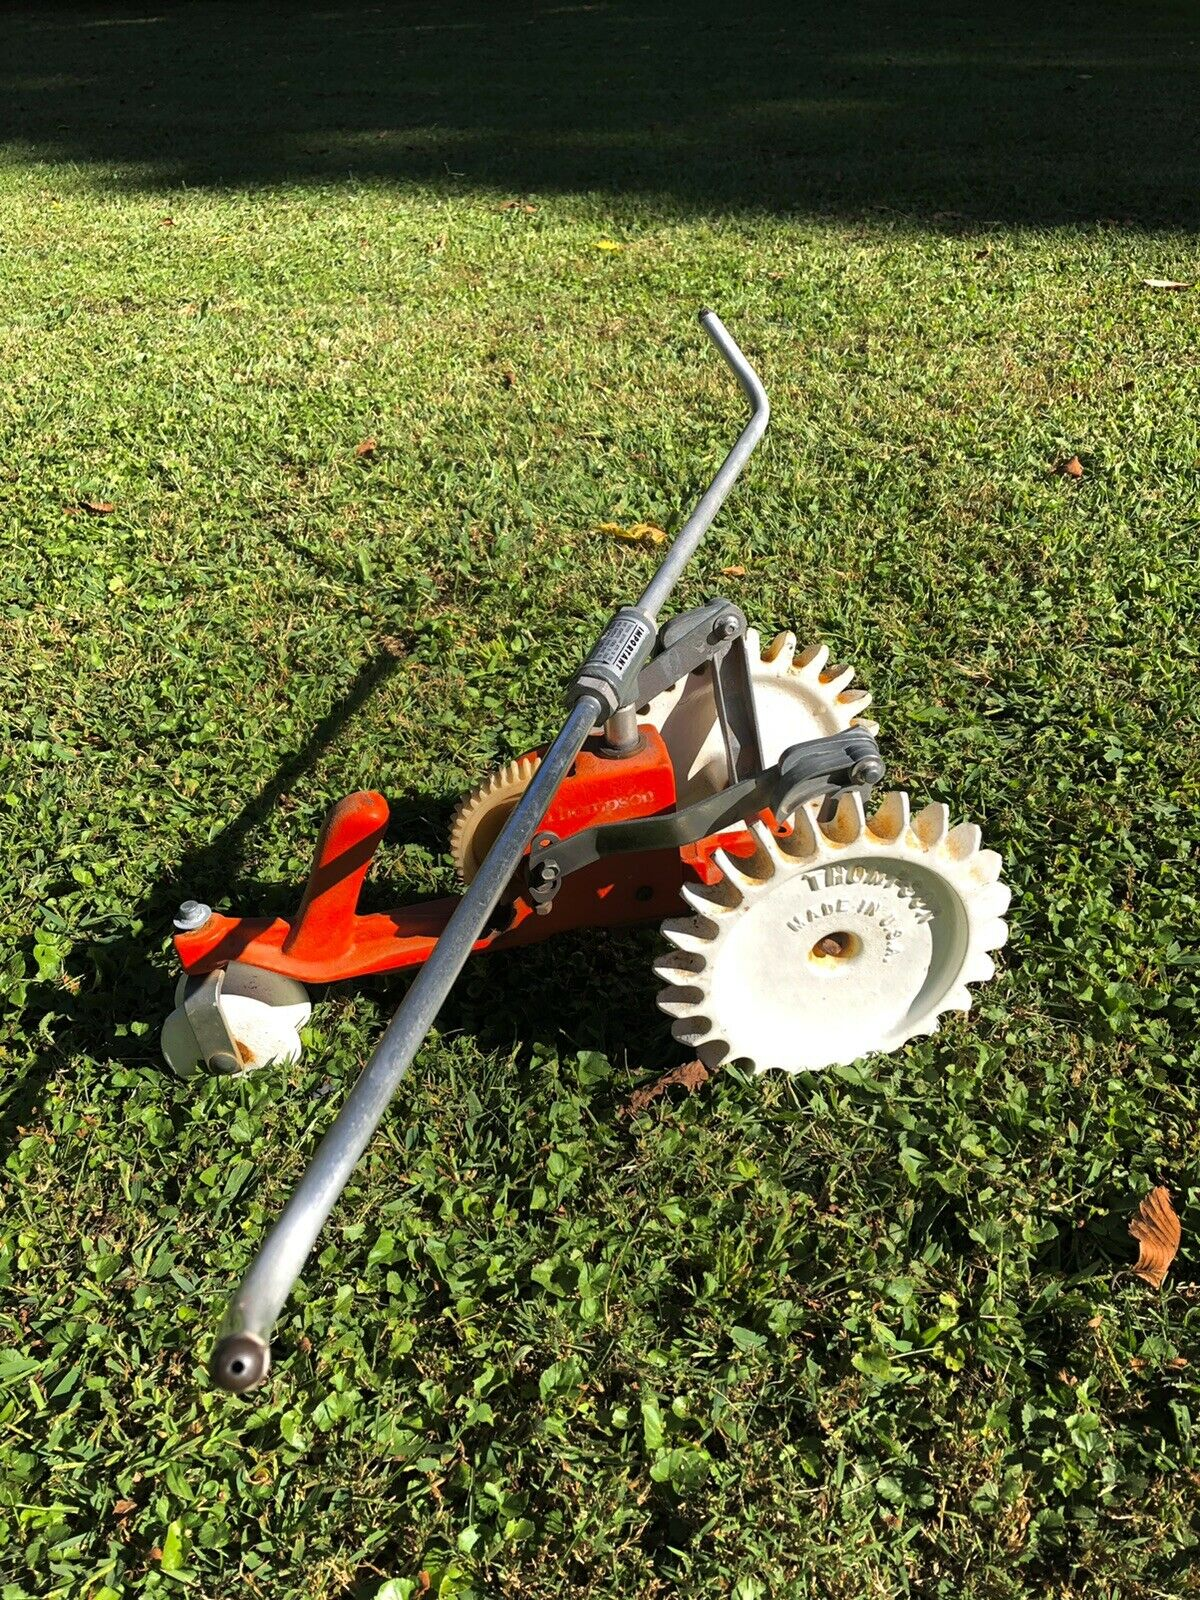 Vintage Thompson Traveling Tractor Walking Cast Iron Lawn Sprinkler Orange/White